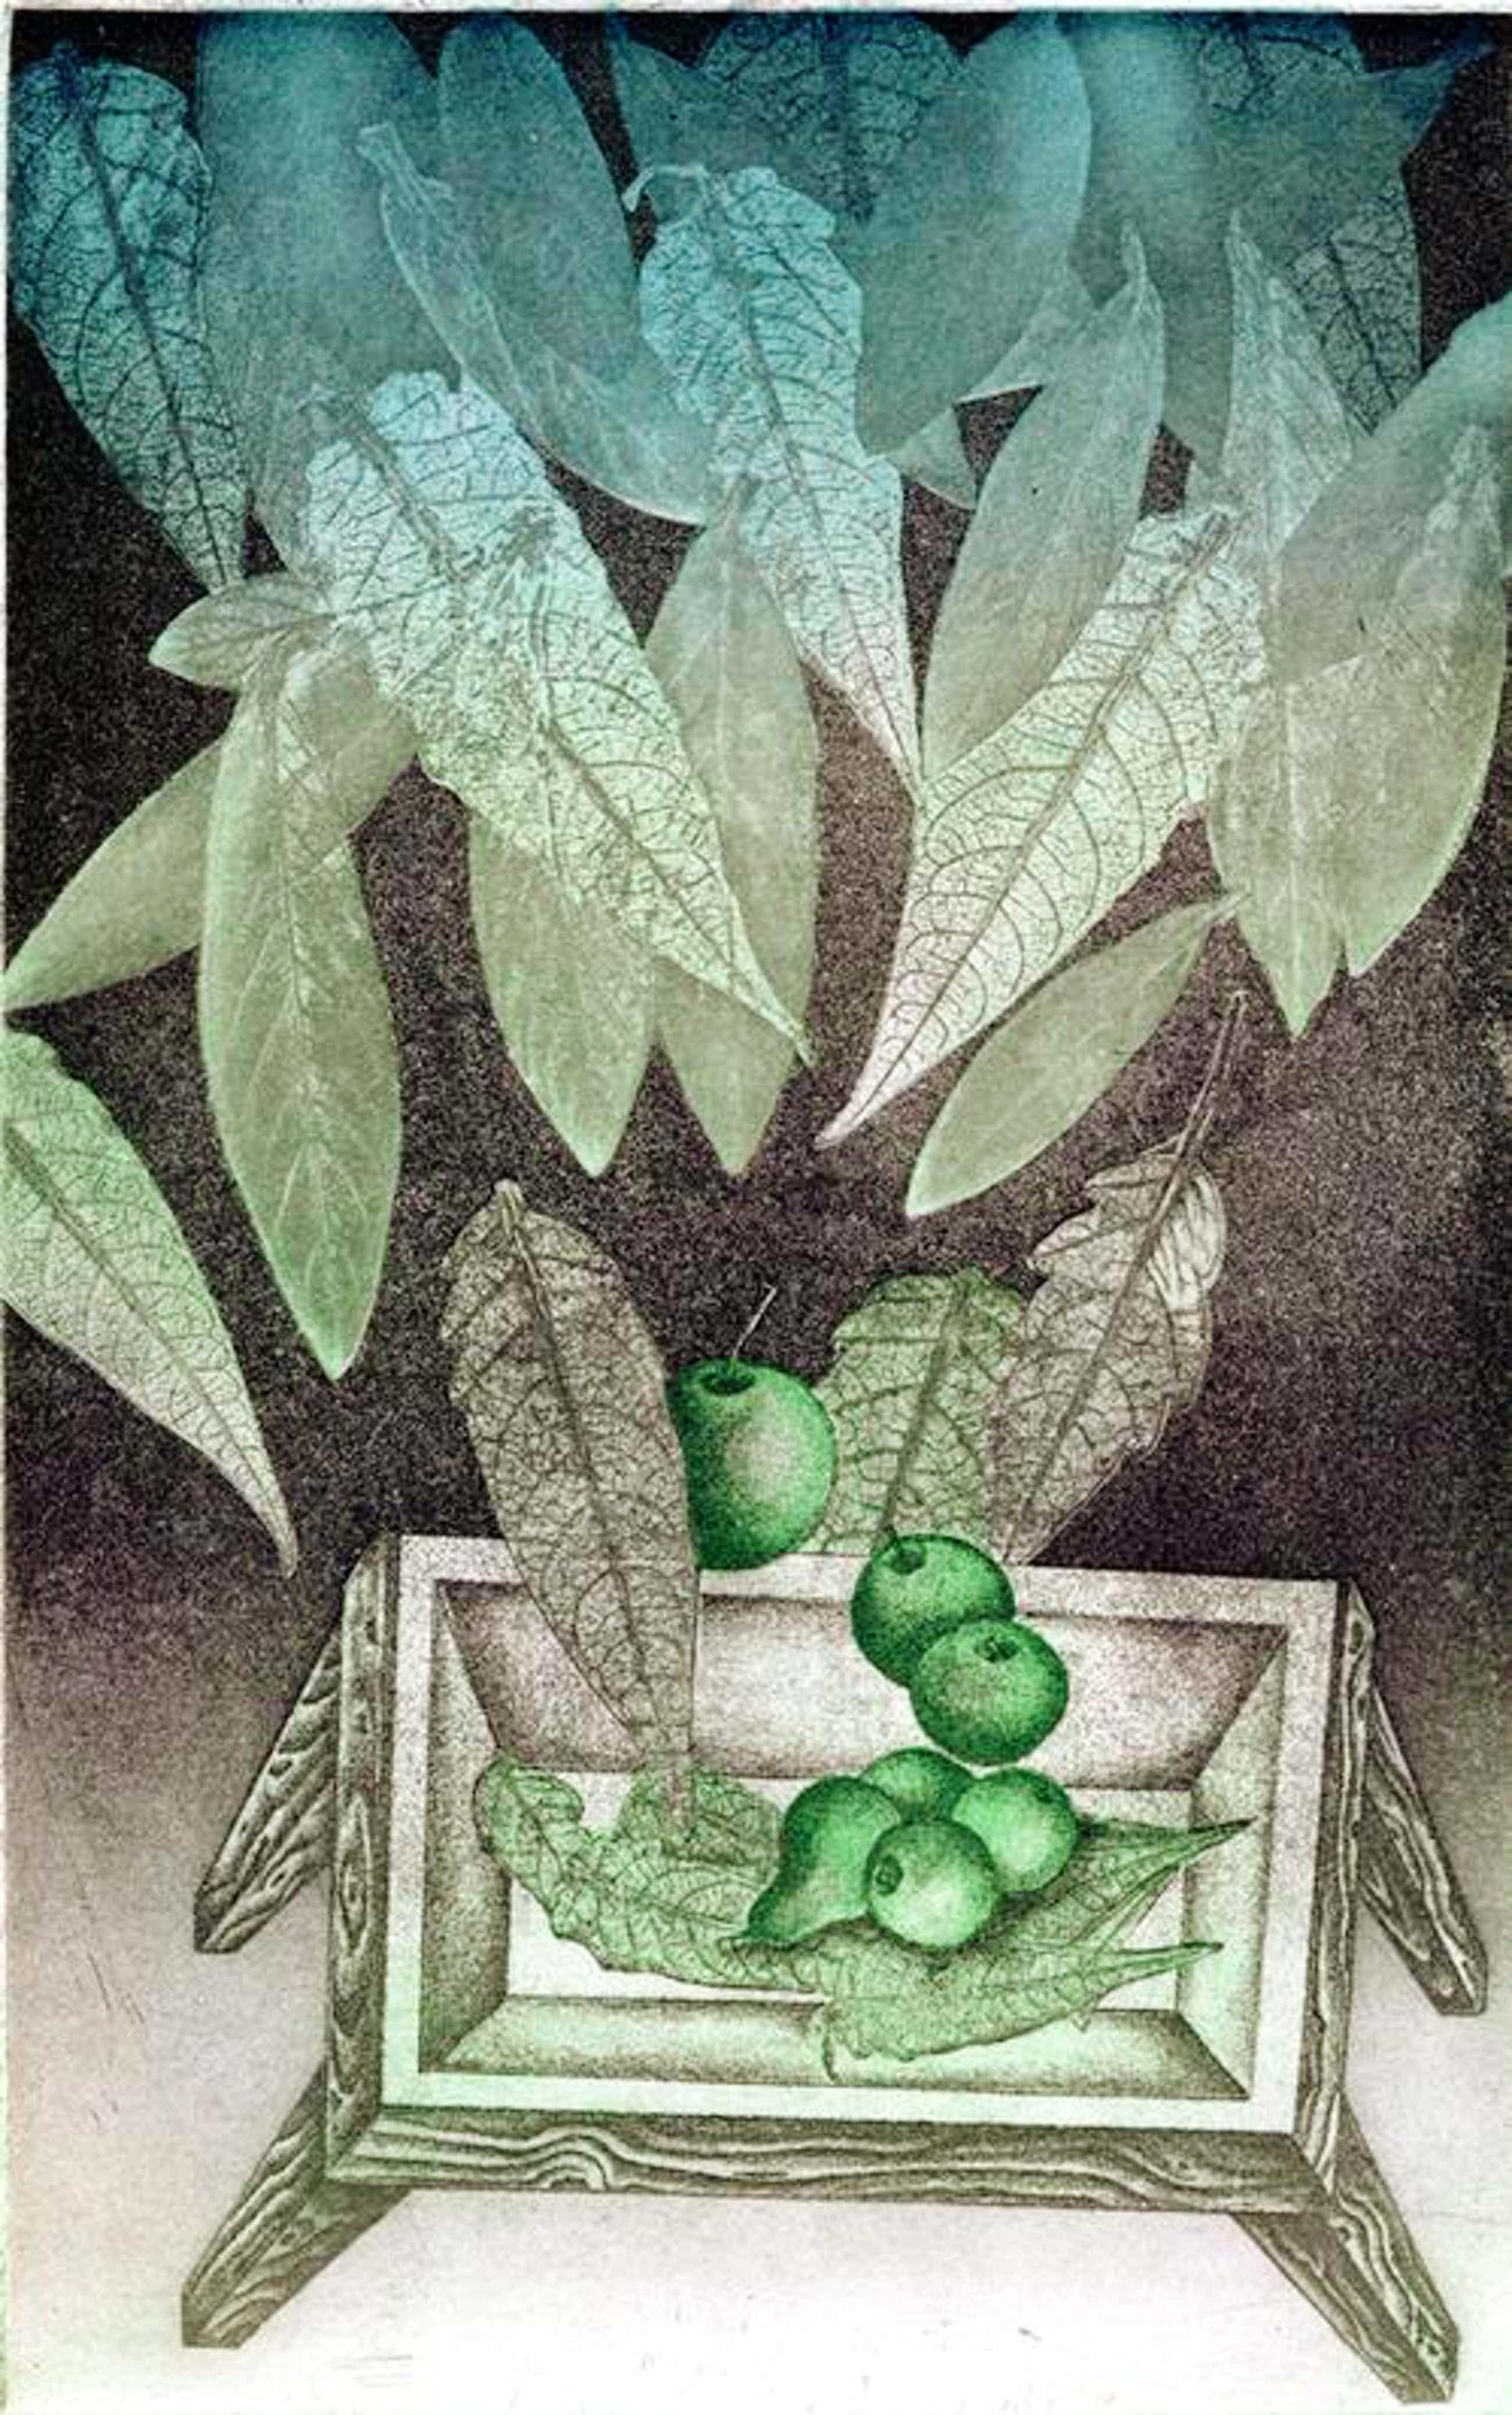 Matheos Florakis - Nature morte aux pommes, Farbradierung, 1976 kopen? Bied vanaf 50!